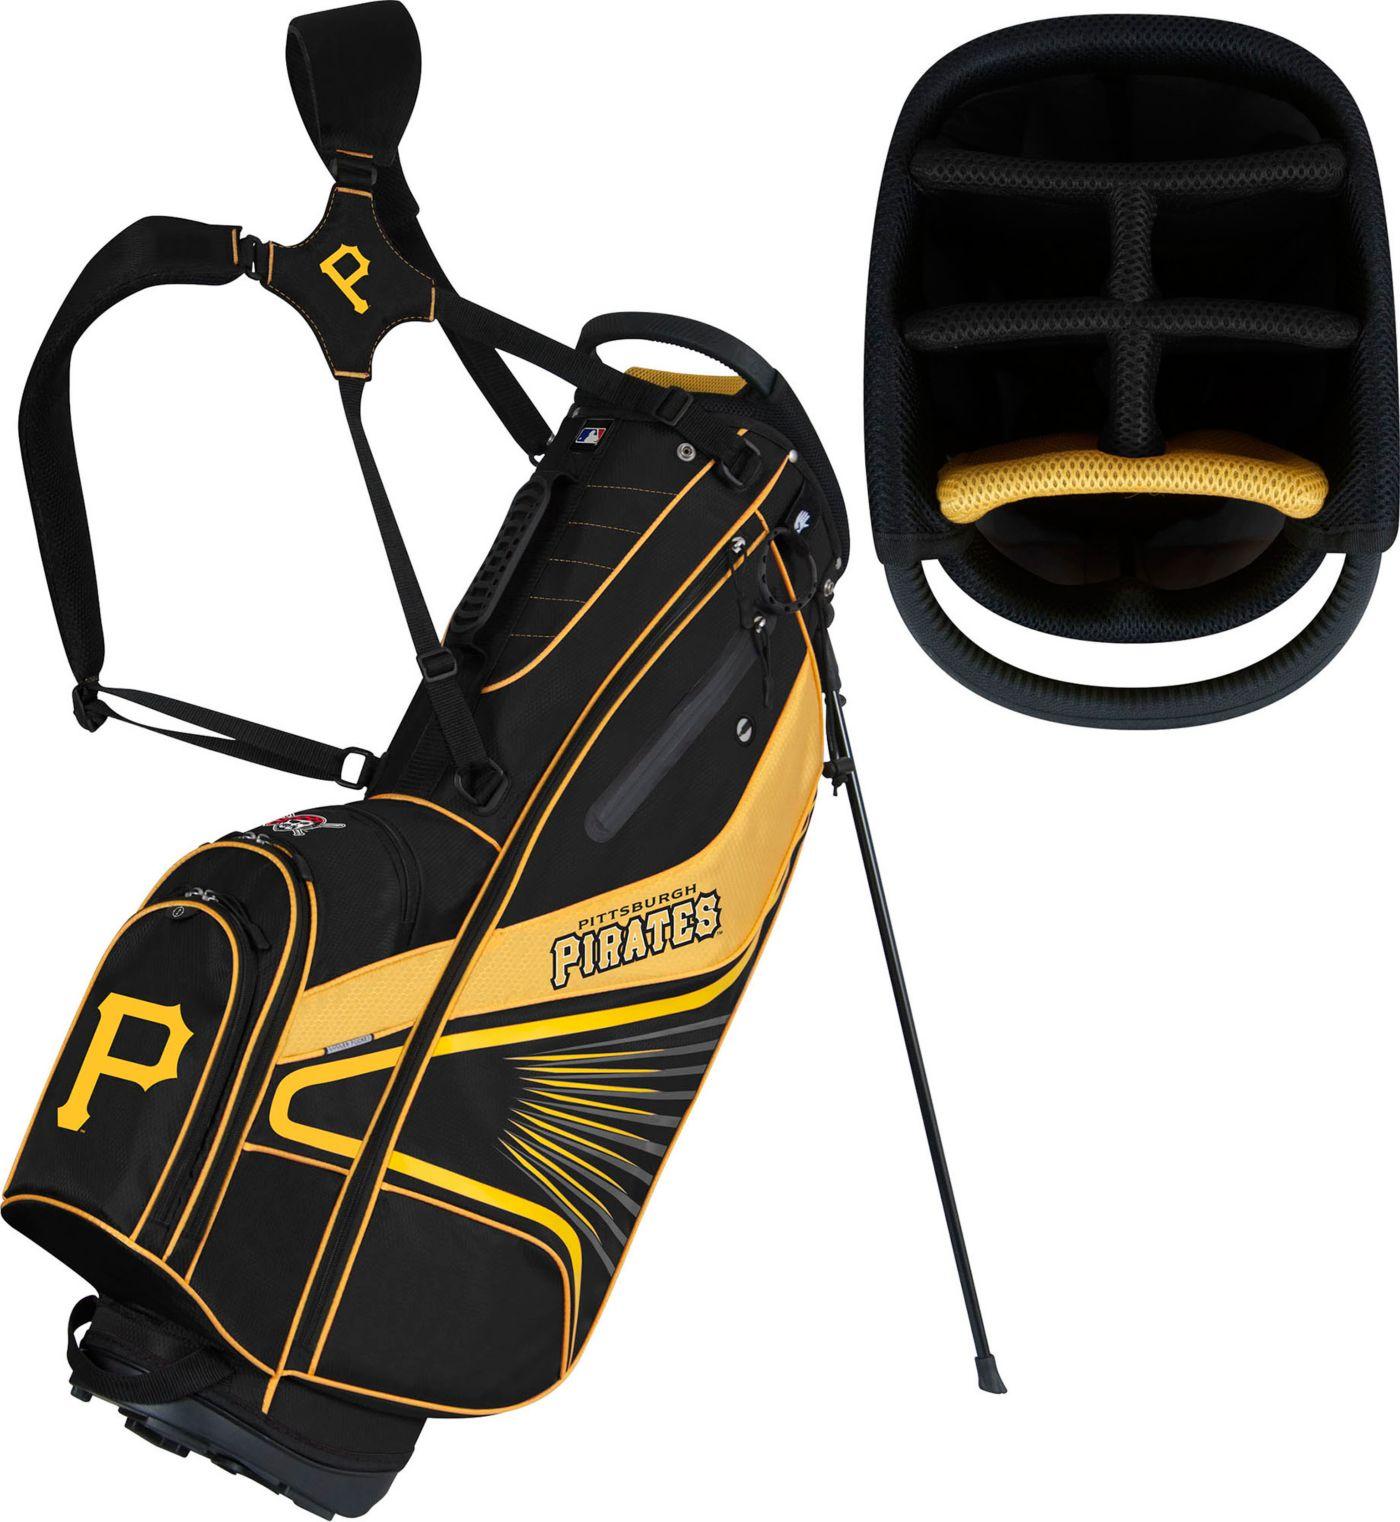 Team Effort Pittsburgh Pirates Caddy Stand Golf Bag